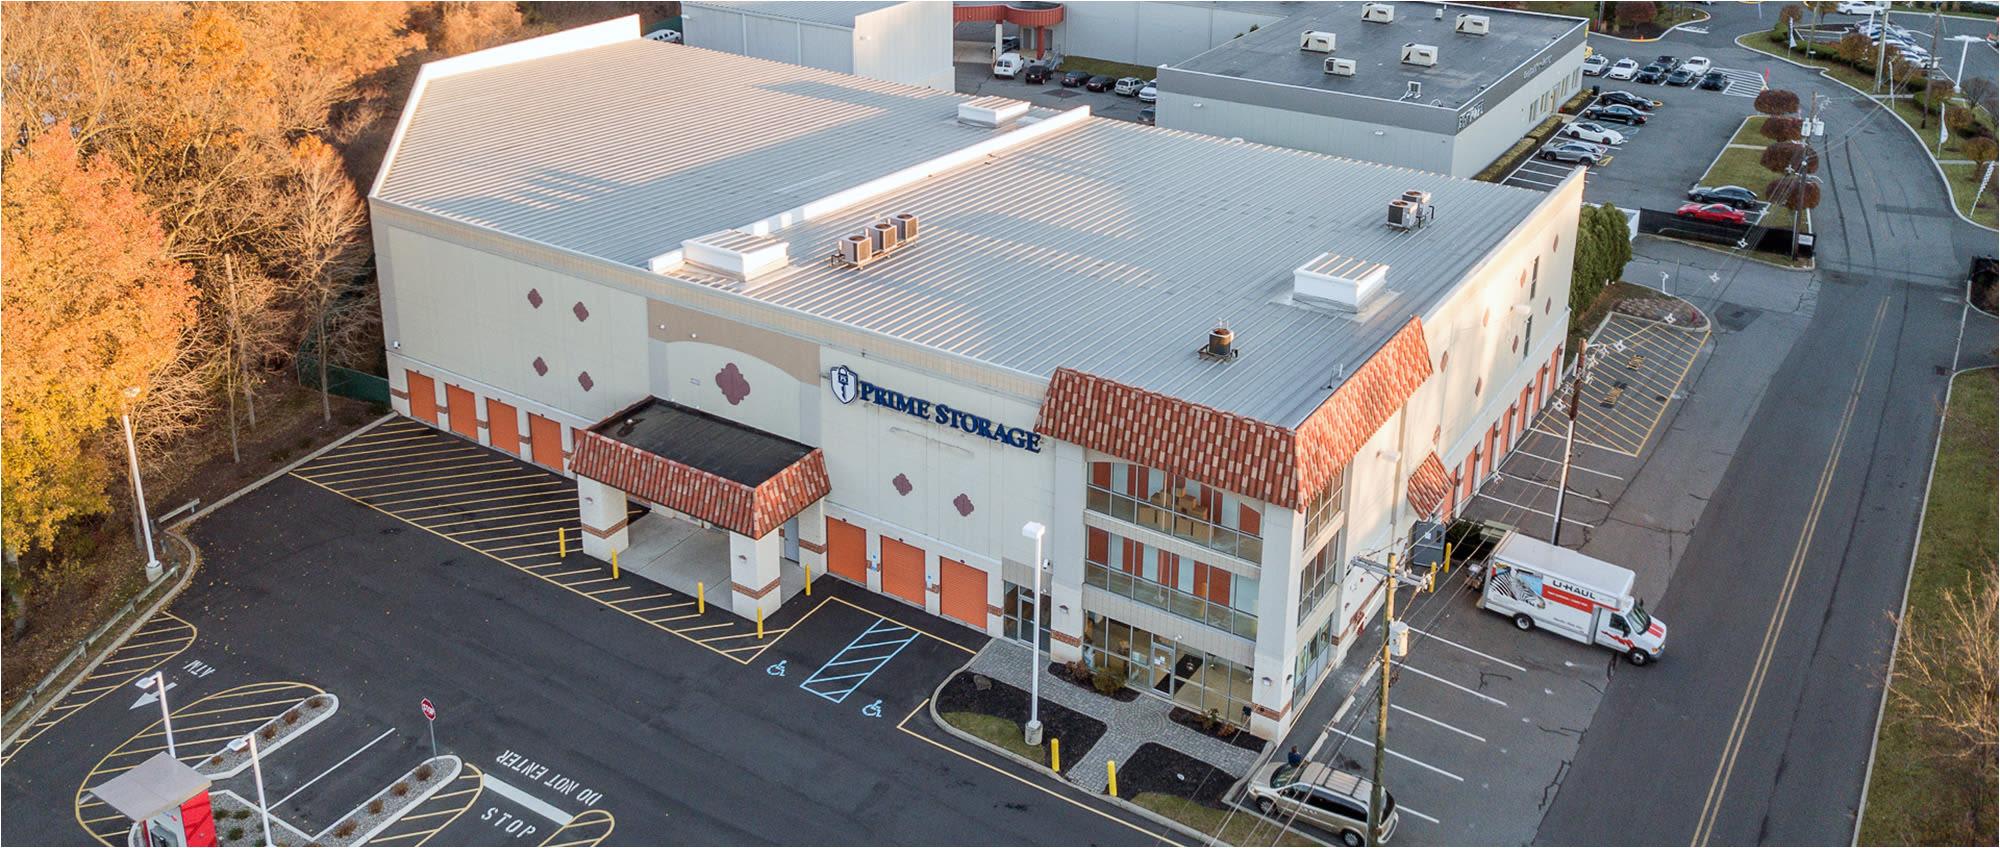 ny aerial view of prime storage in saratoga springs ny storage units